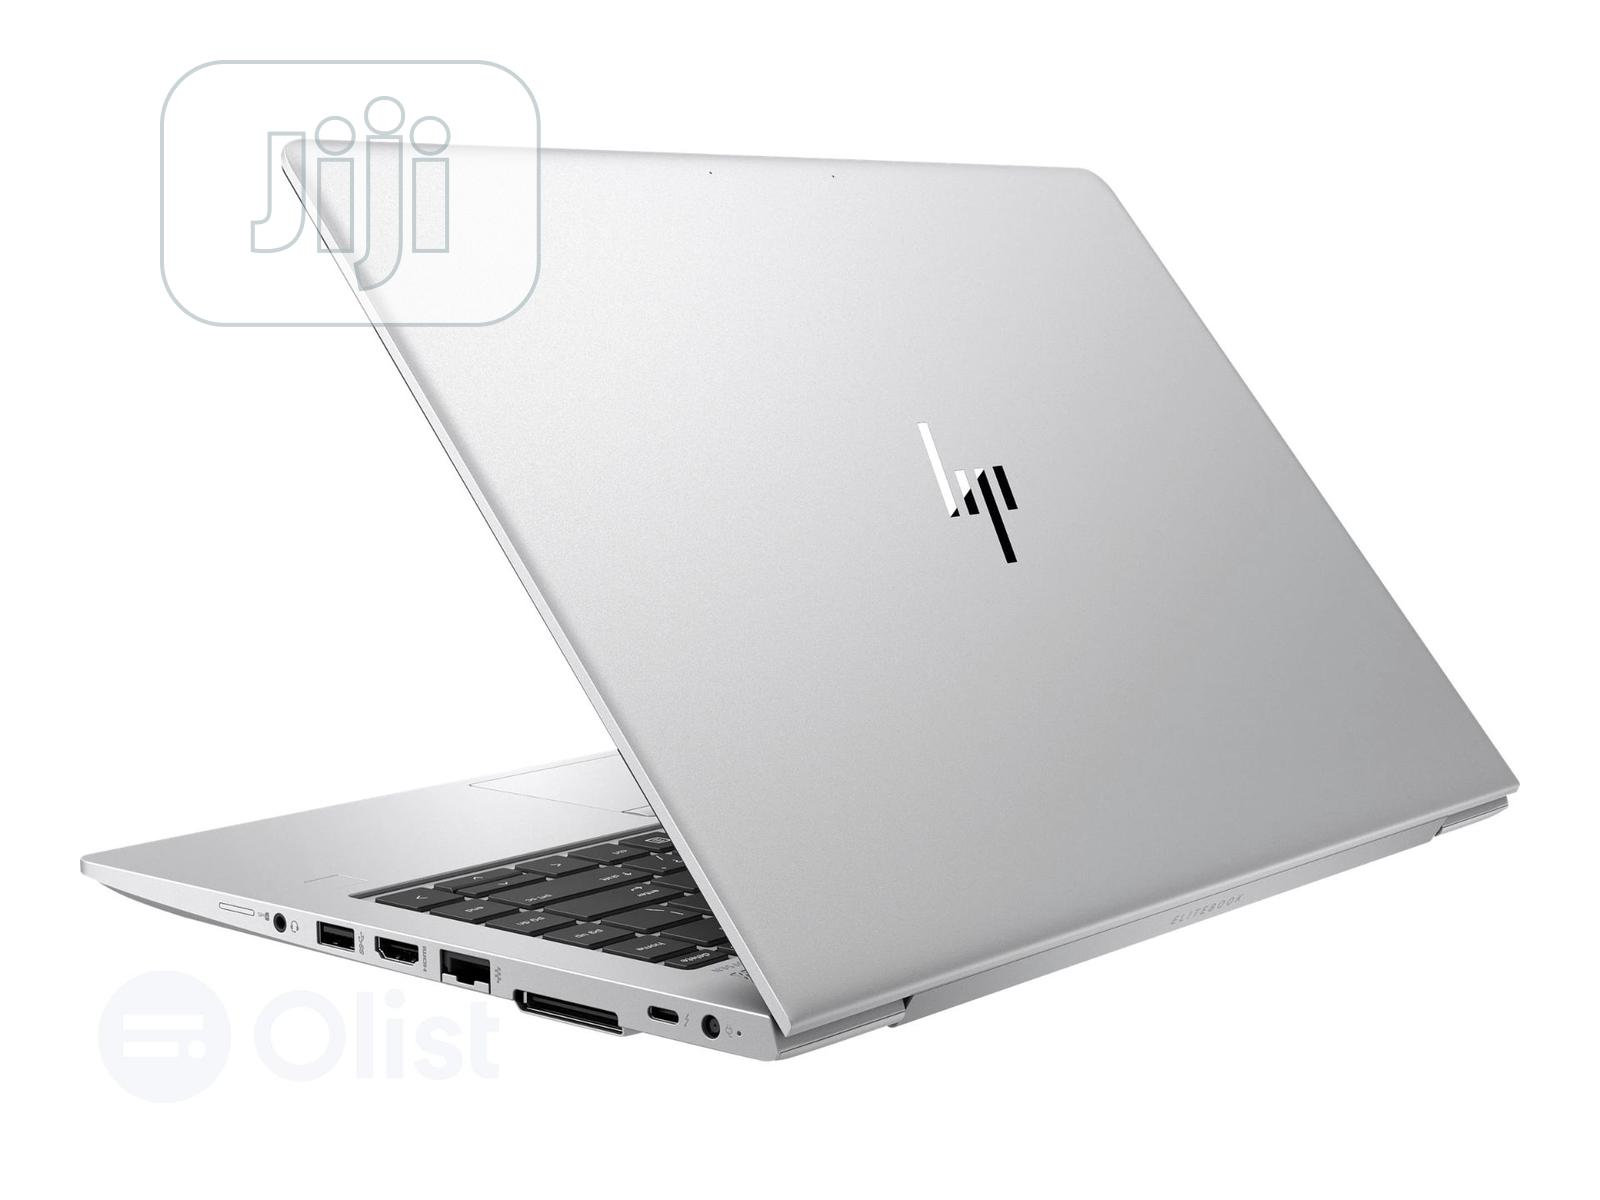 New Laptop HP EliteBook 840 G6 32GB Intel Core I7 SSD 512GB | Laptops & Computers for sale in Ikeja, Lagos State, Nigeria